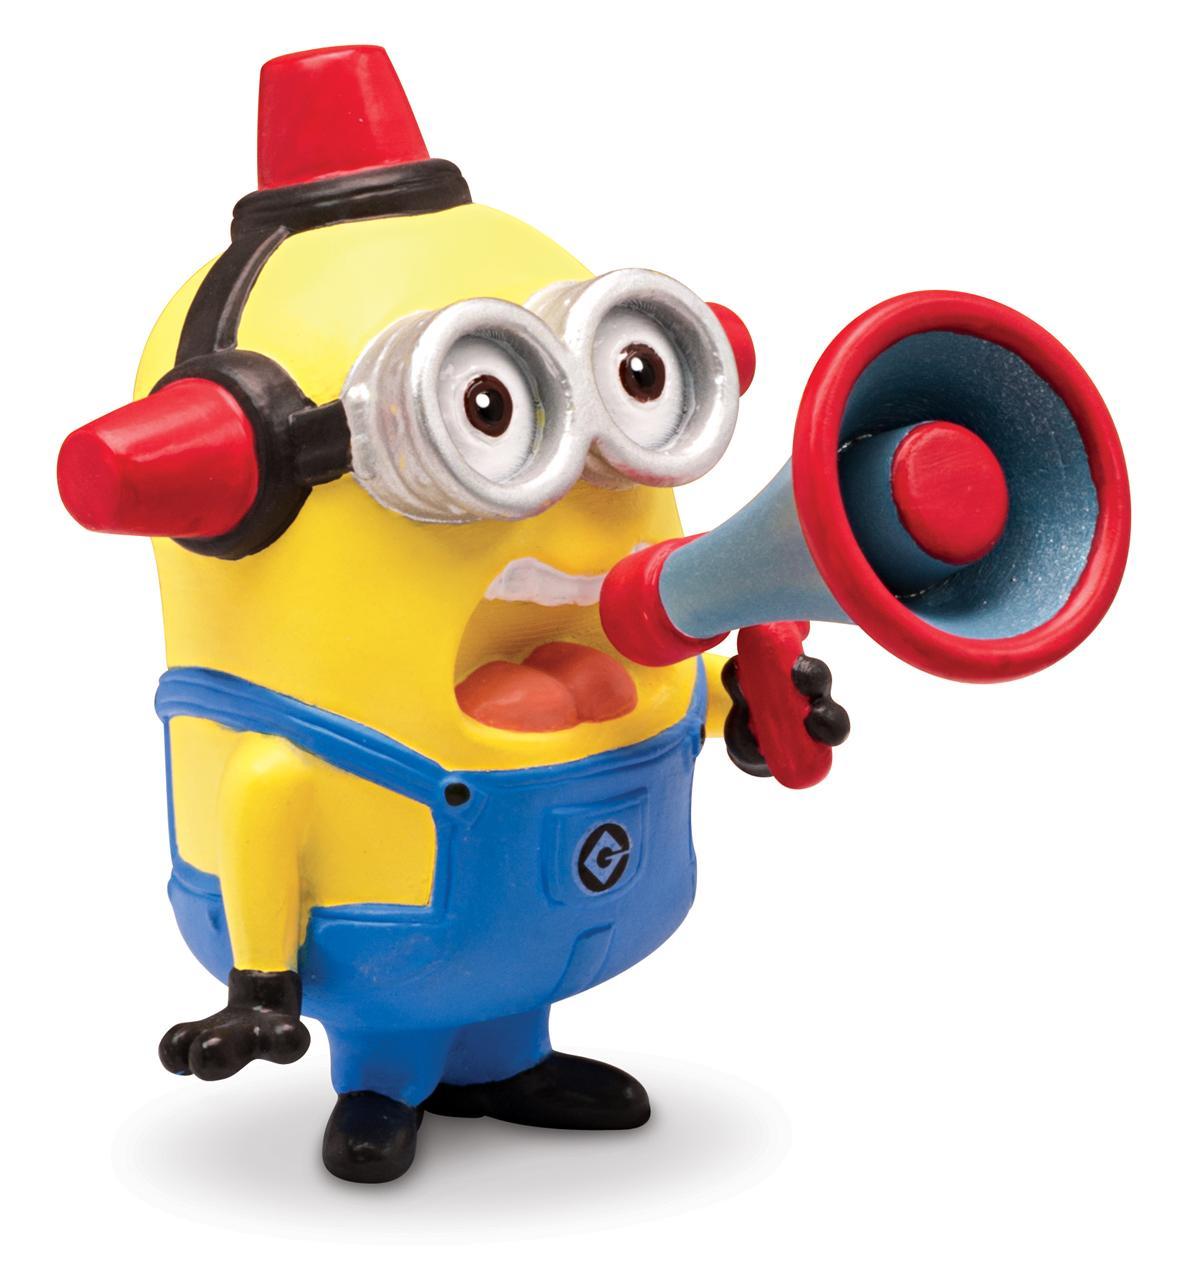 Despicable Me 2 Minions Fireman BEEDO Figure